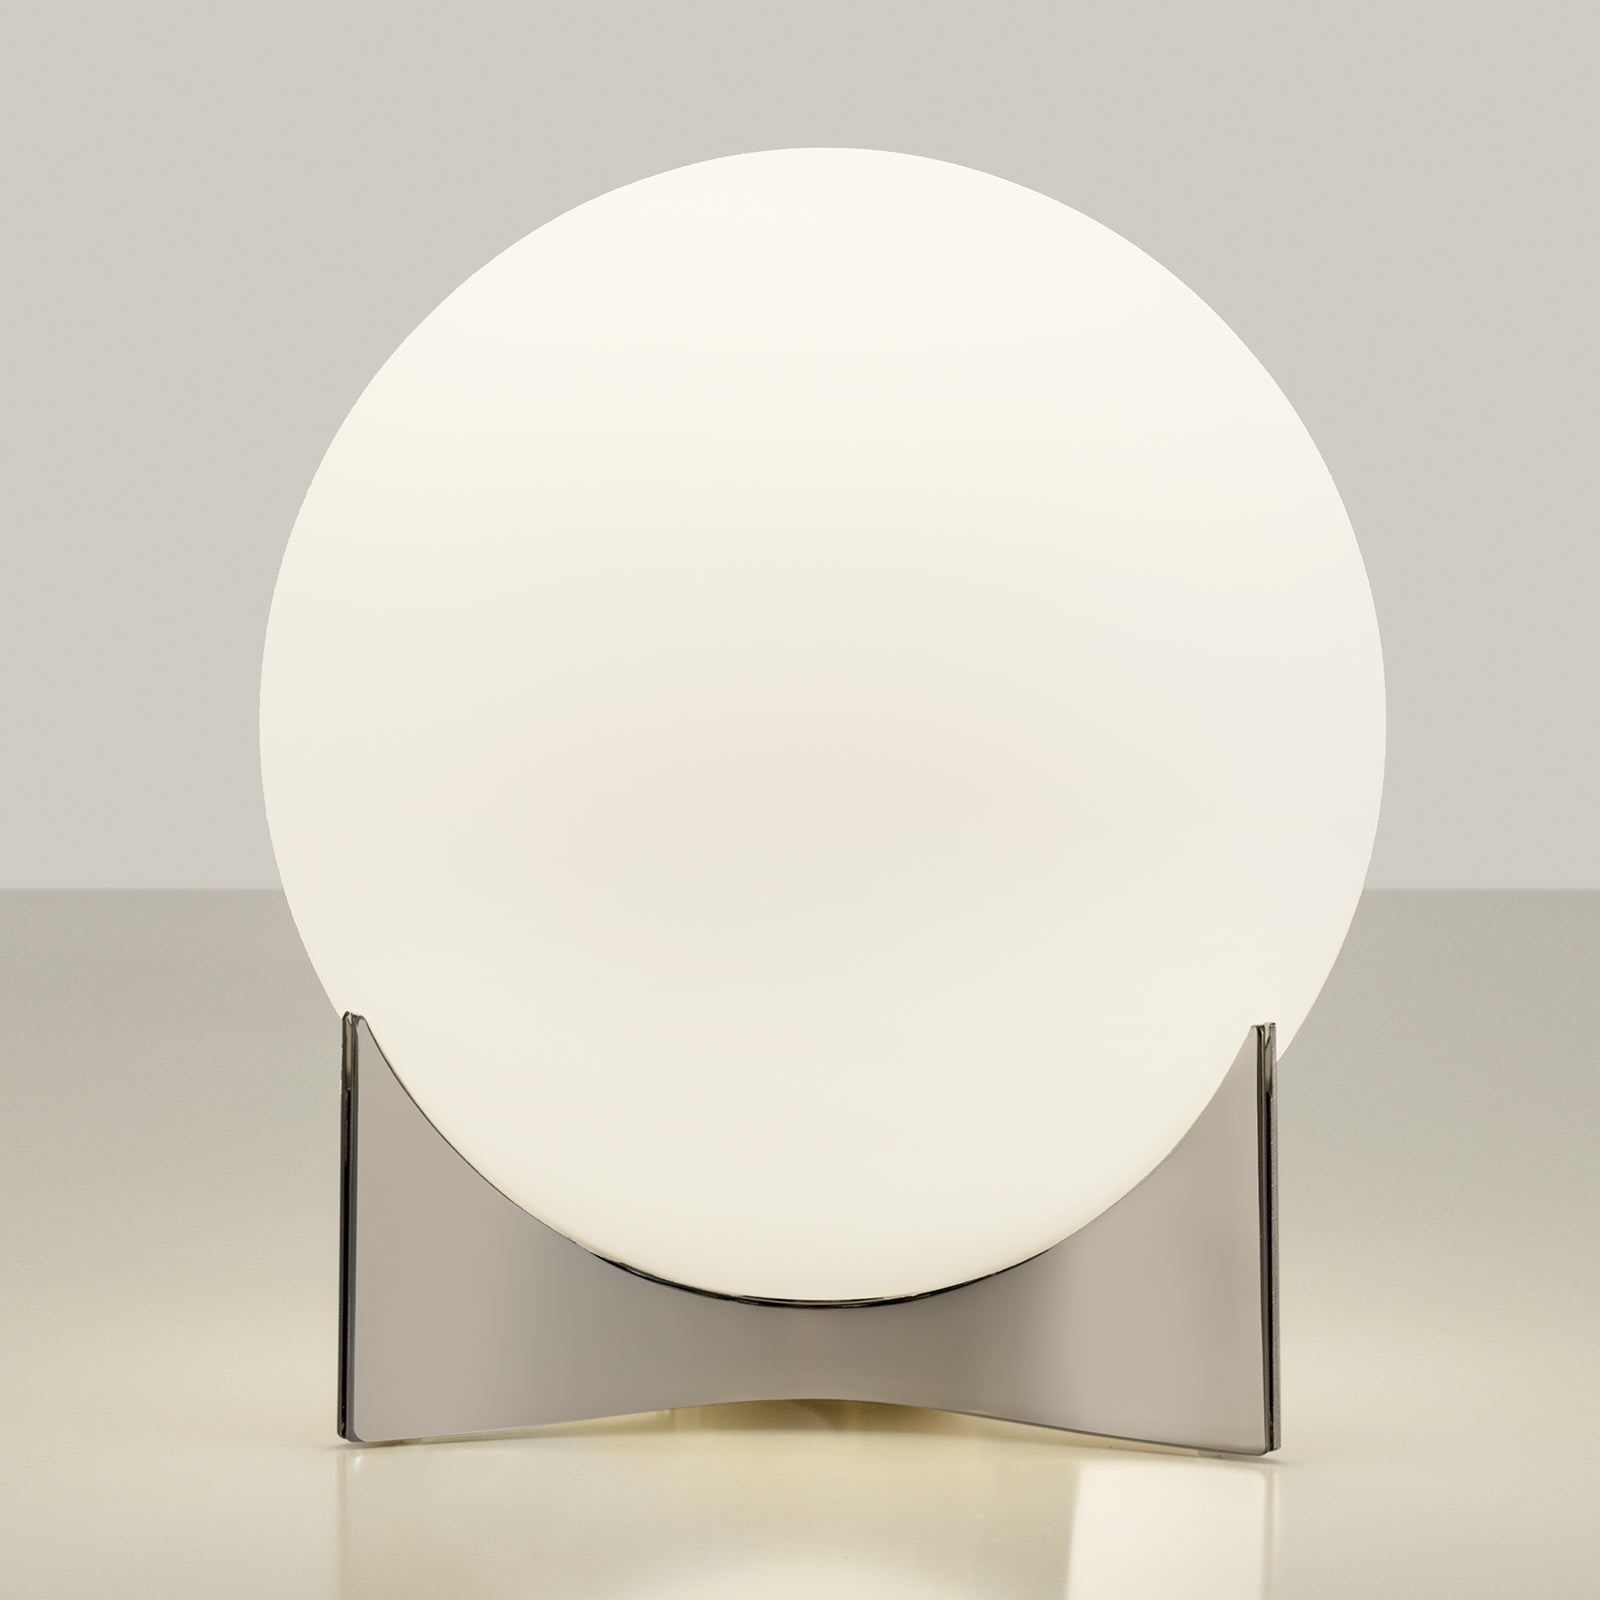 Terzani Oscar tafellamp van glas, nikkel